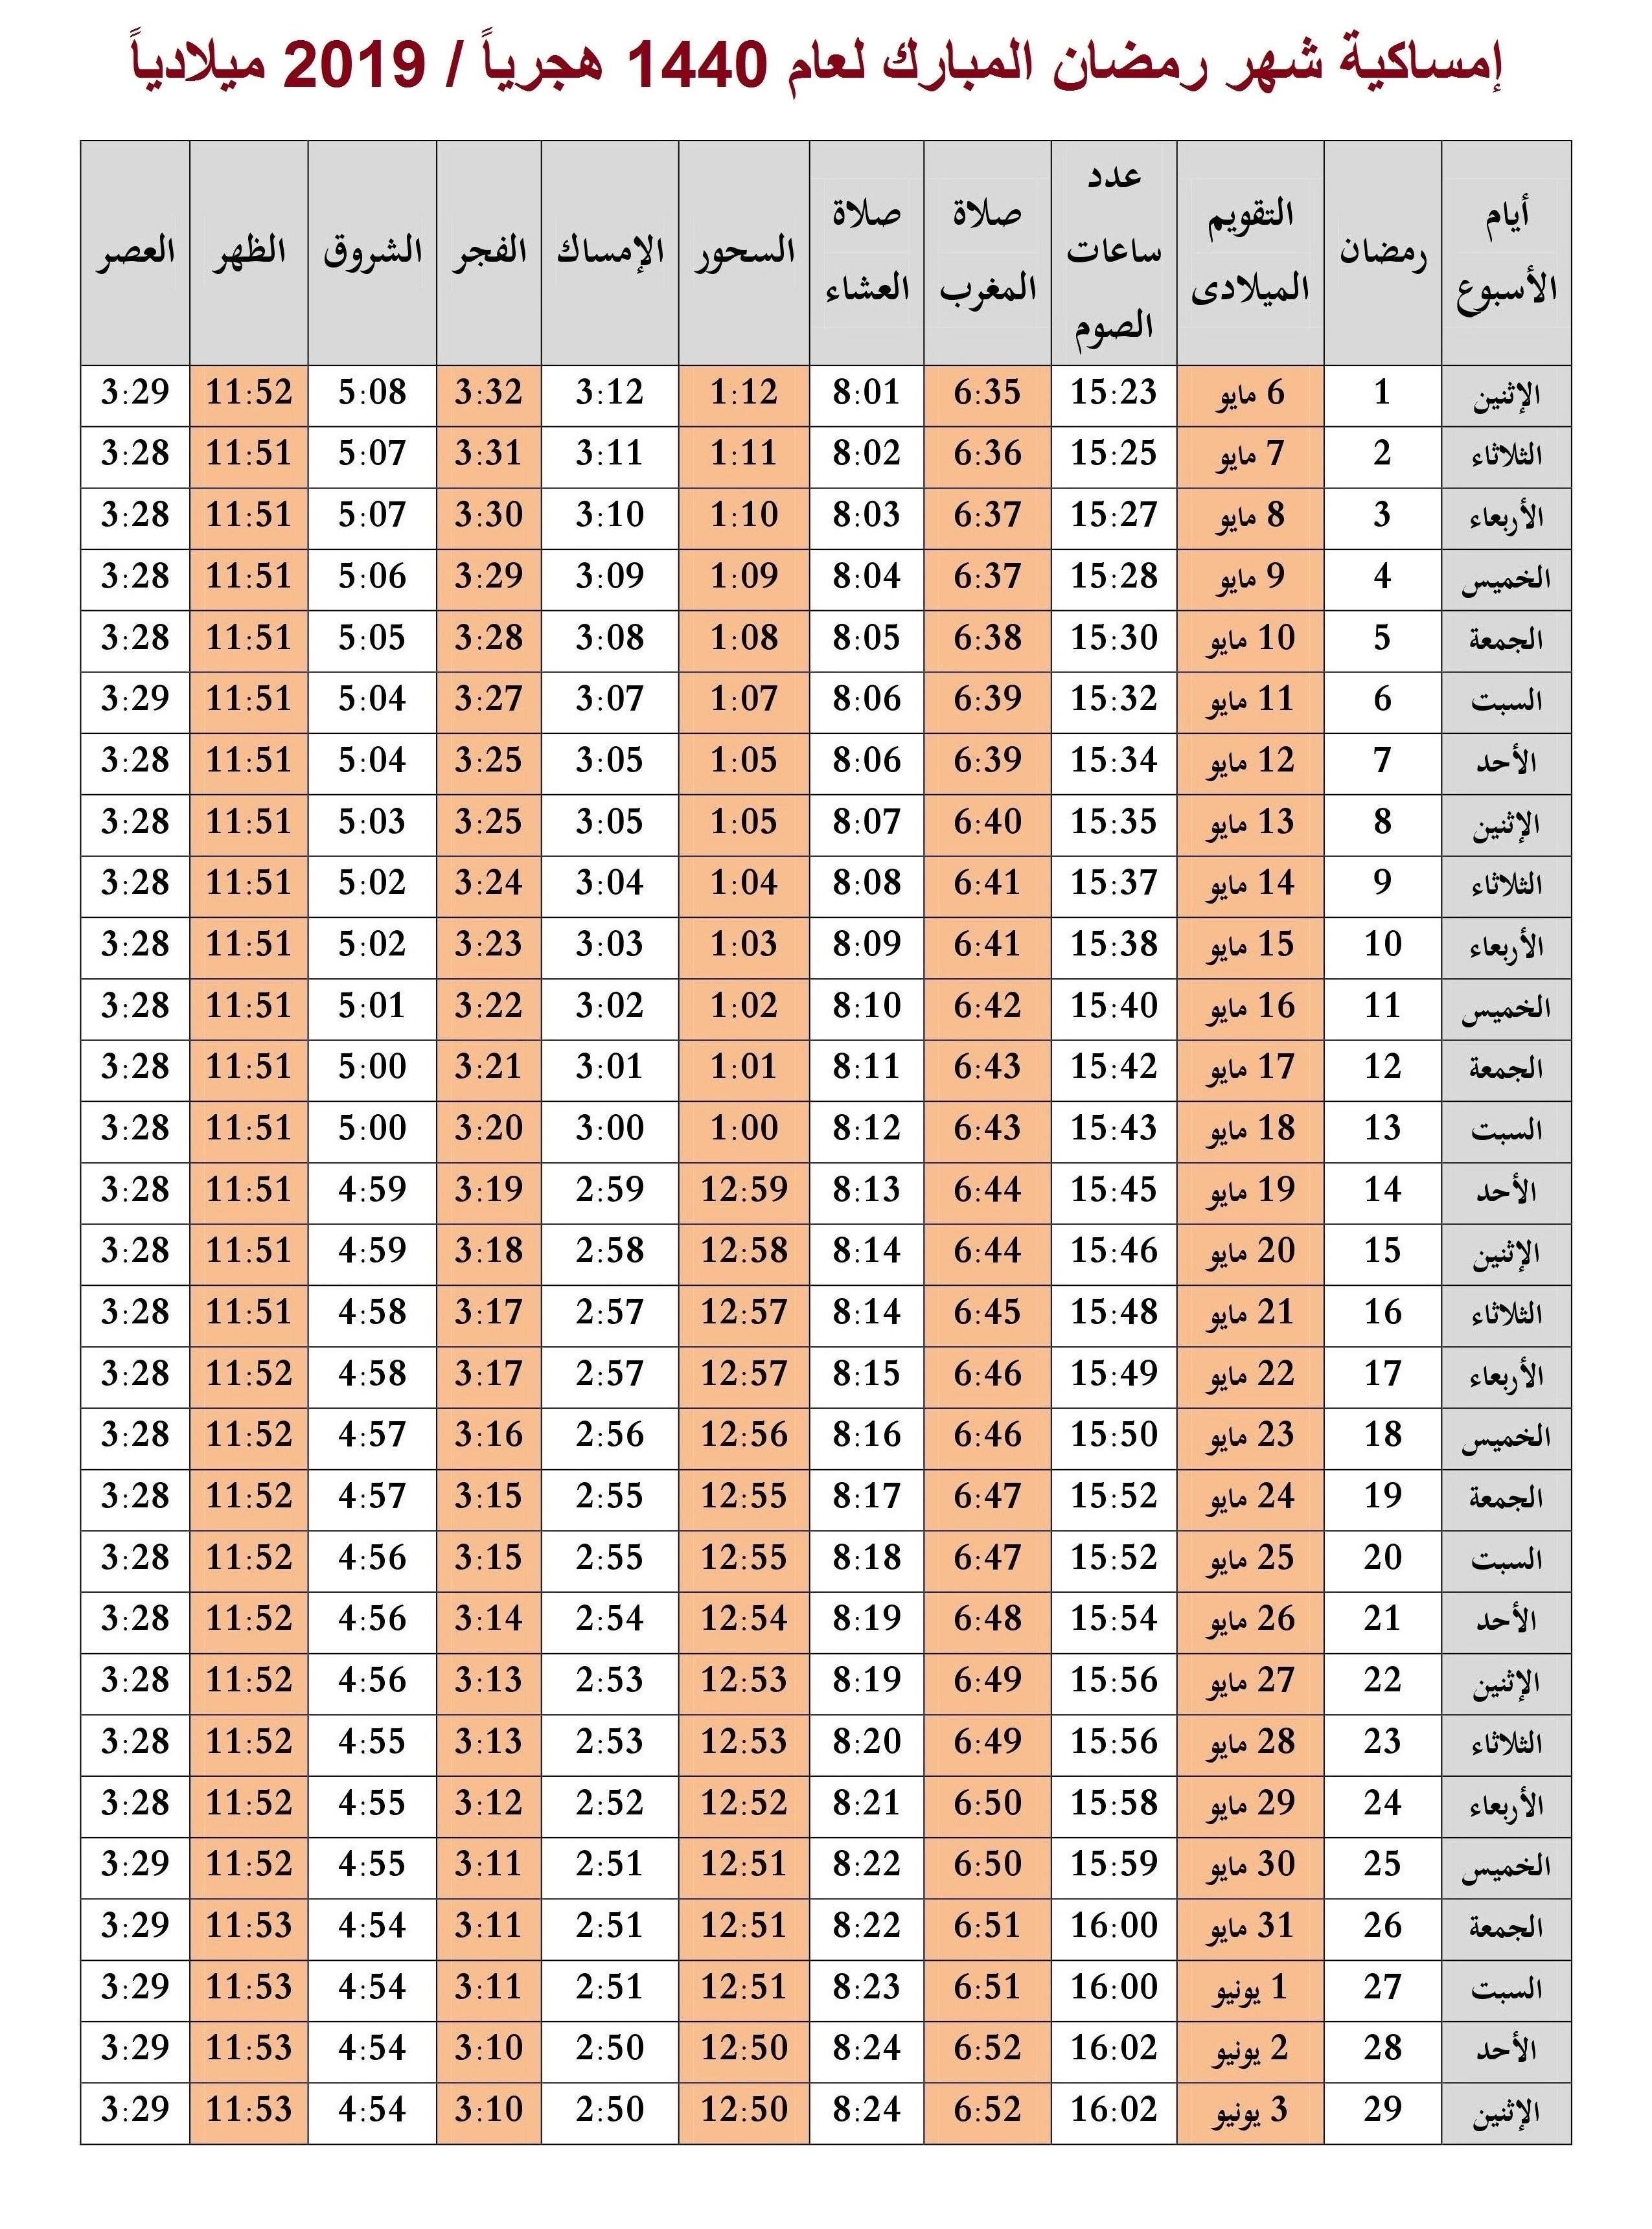 امساكية شهر رمضان 1440 2019